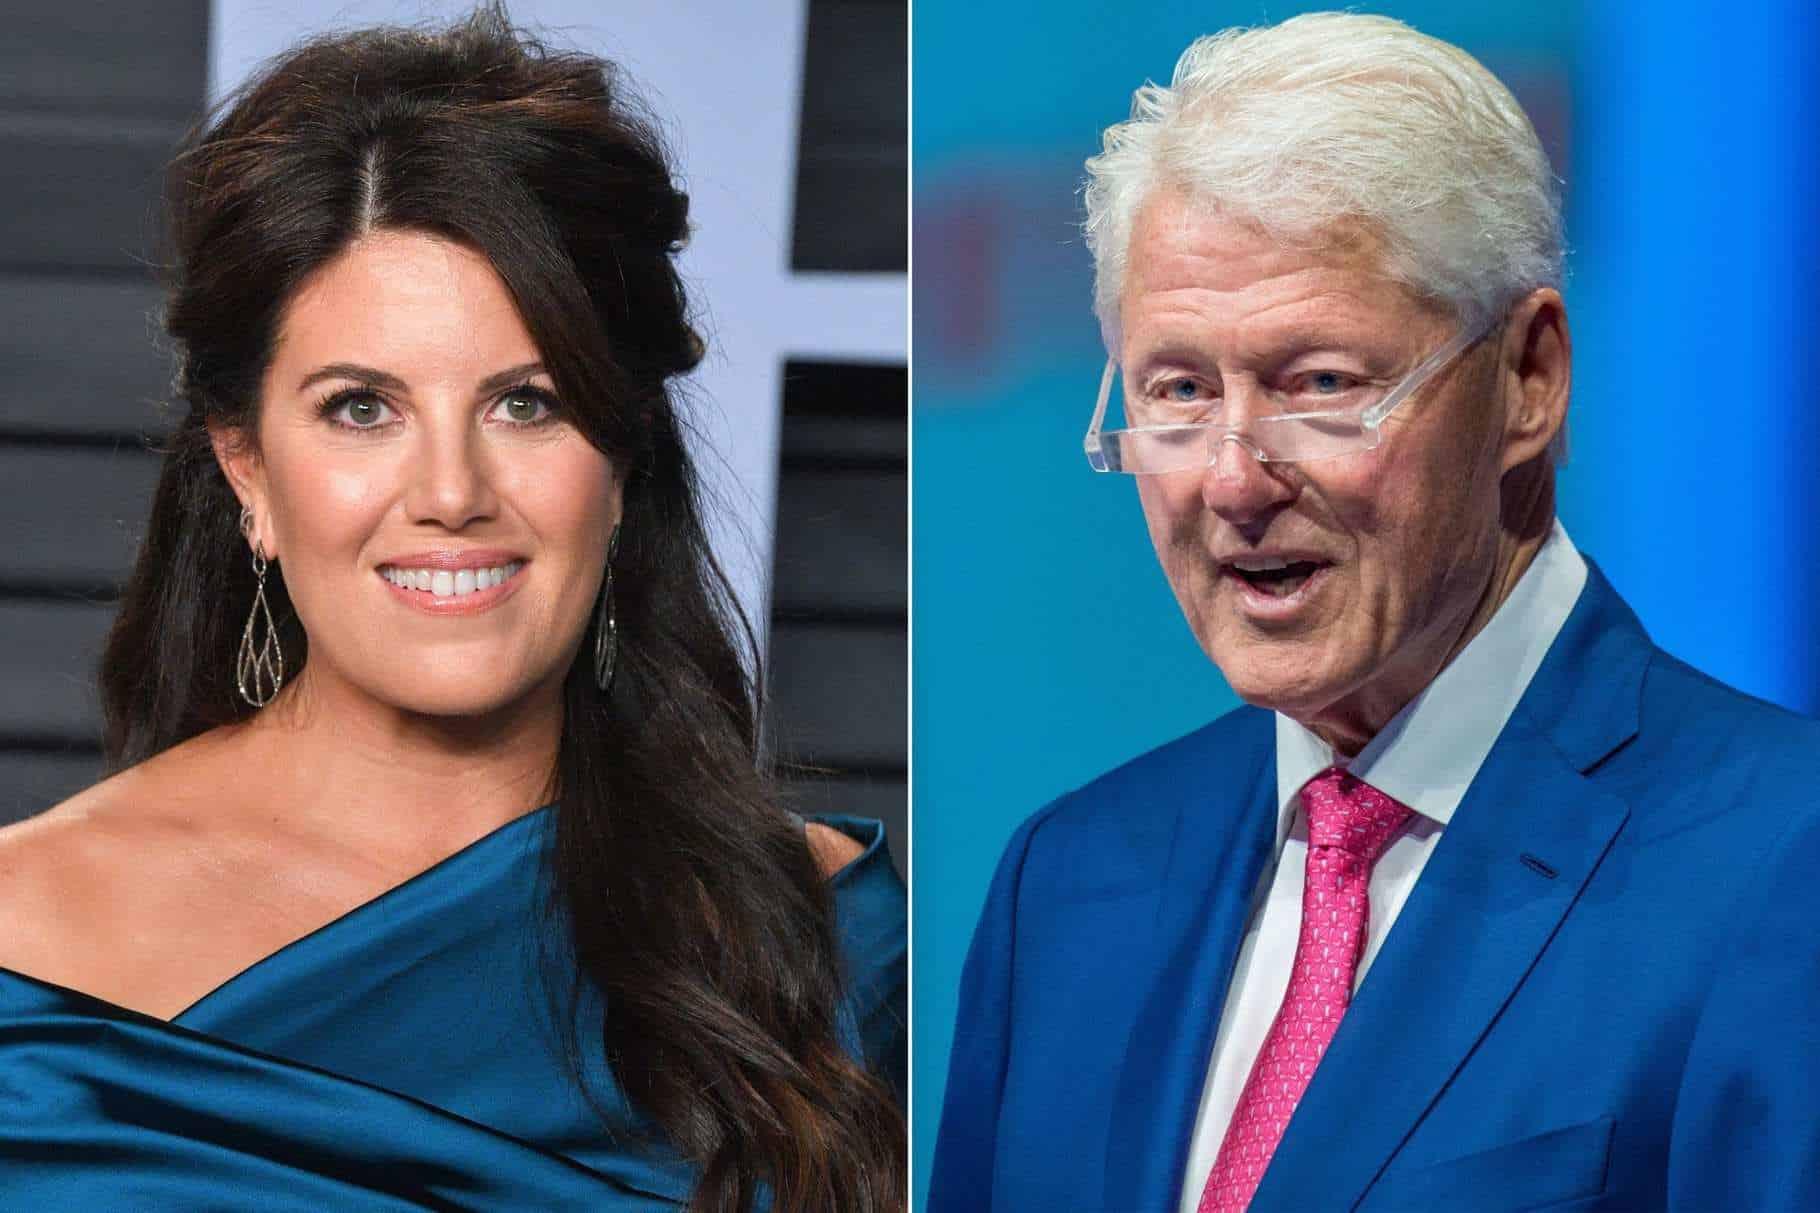 I flashed my underwear to attract Bill Clinton - Monica Lewinsky